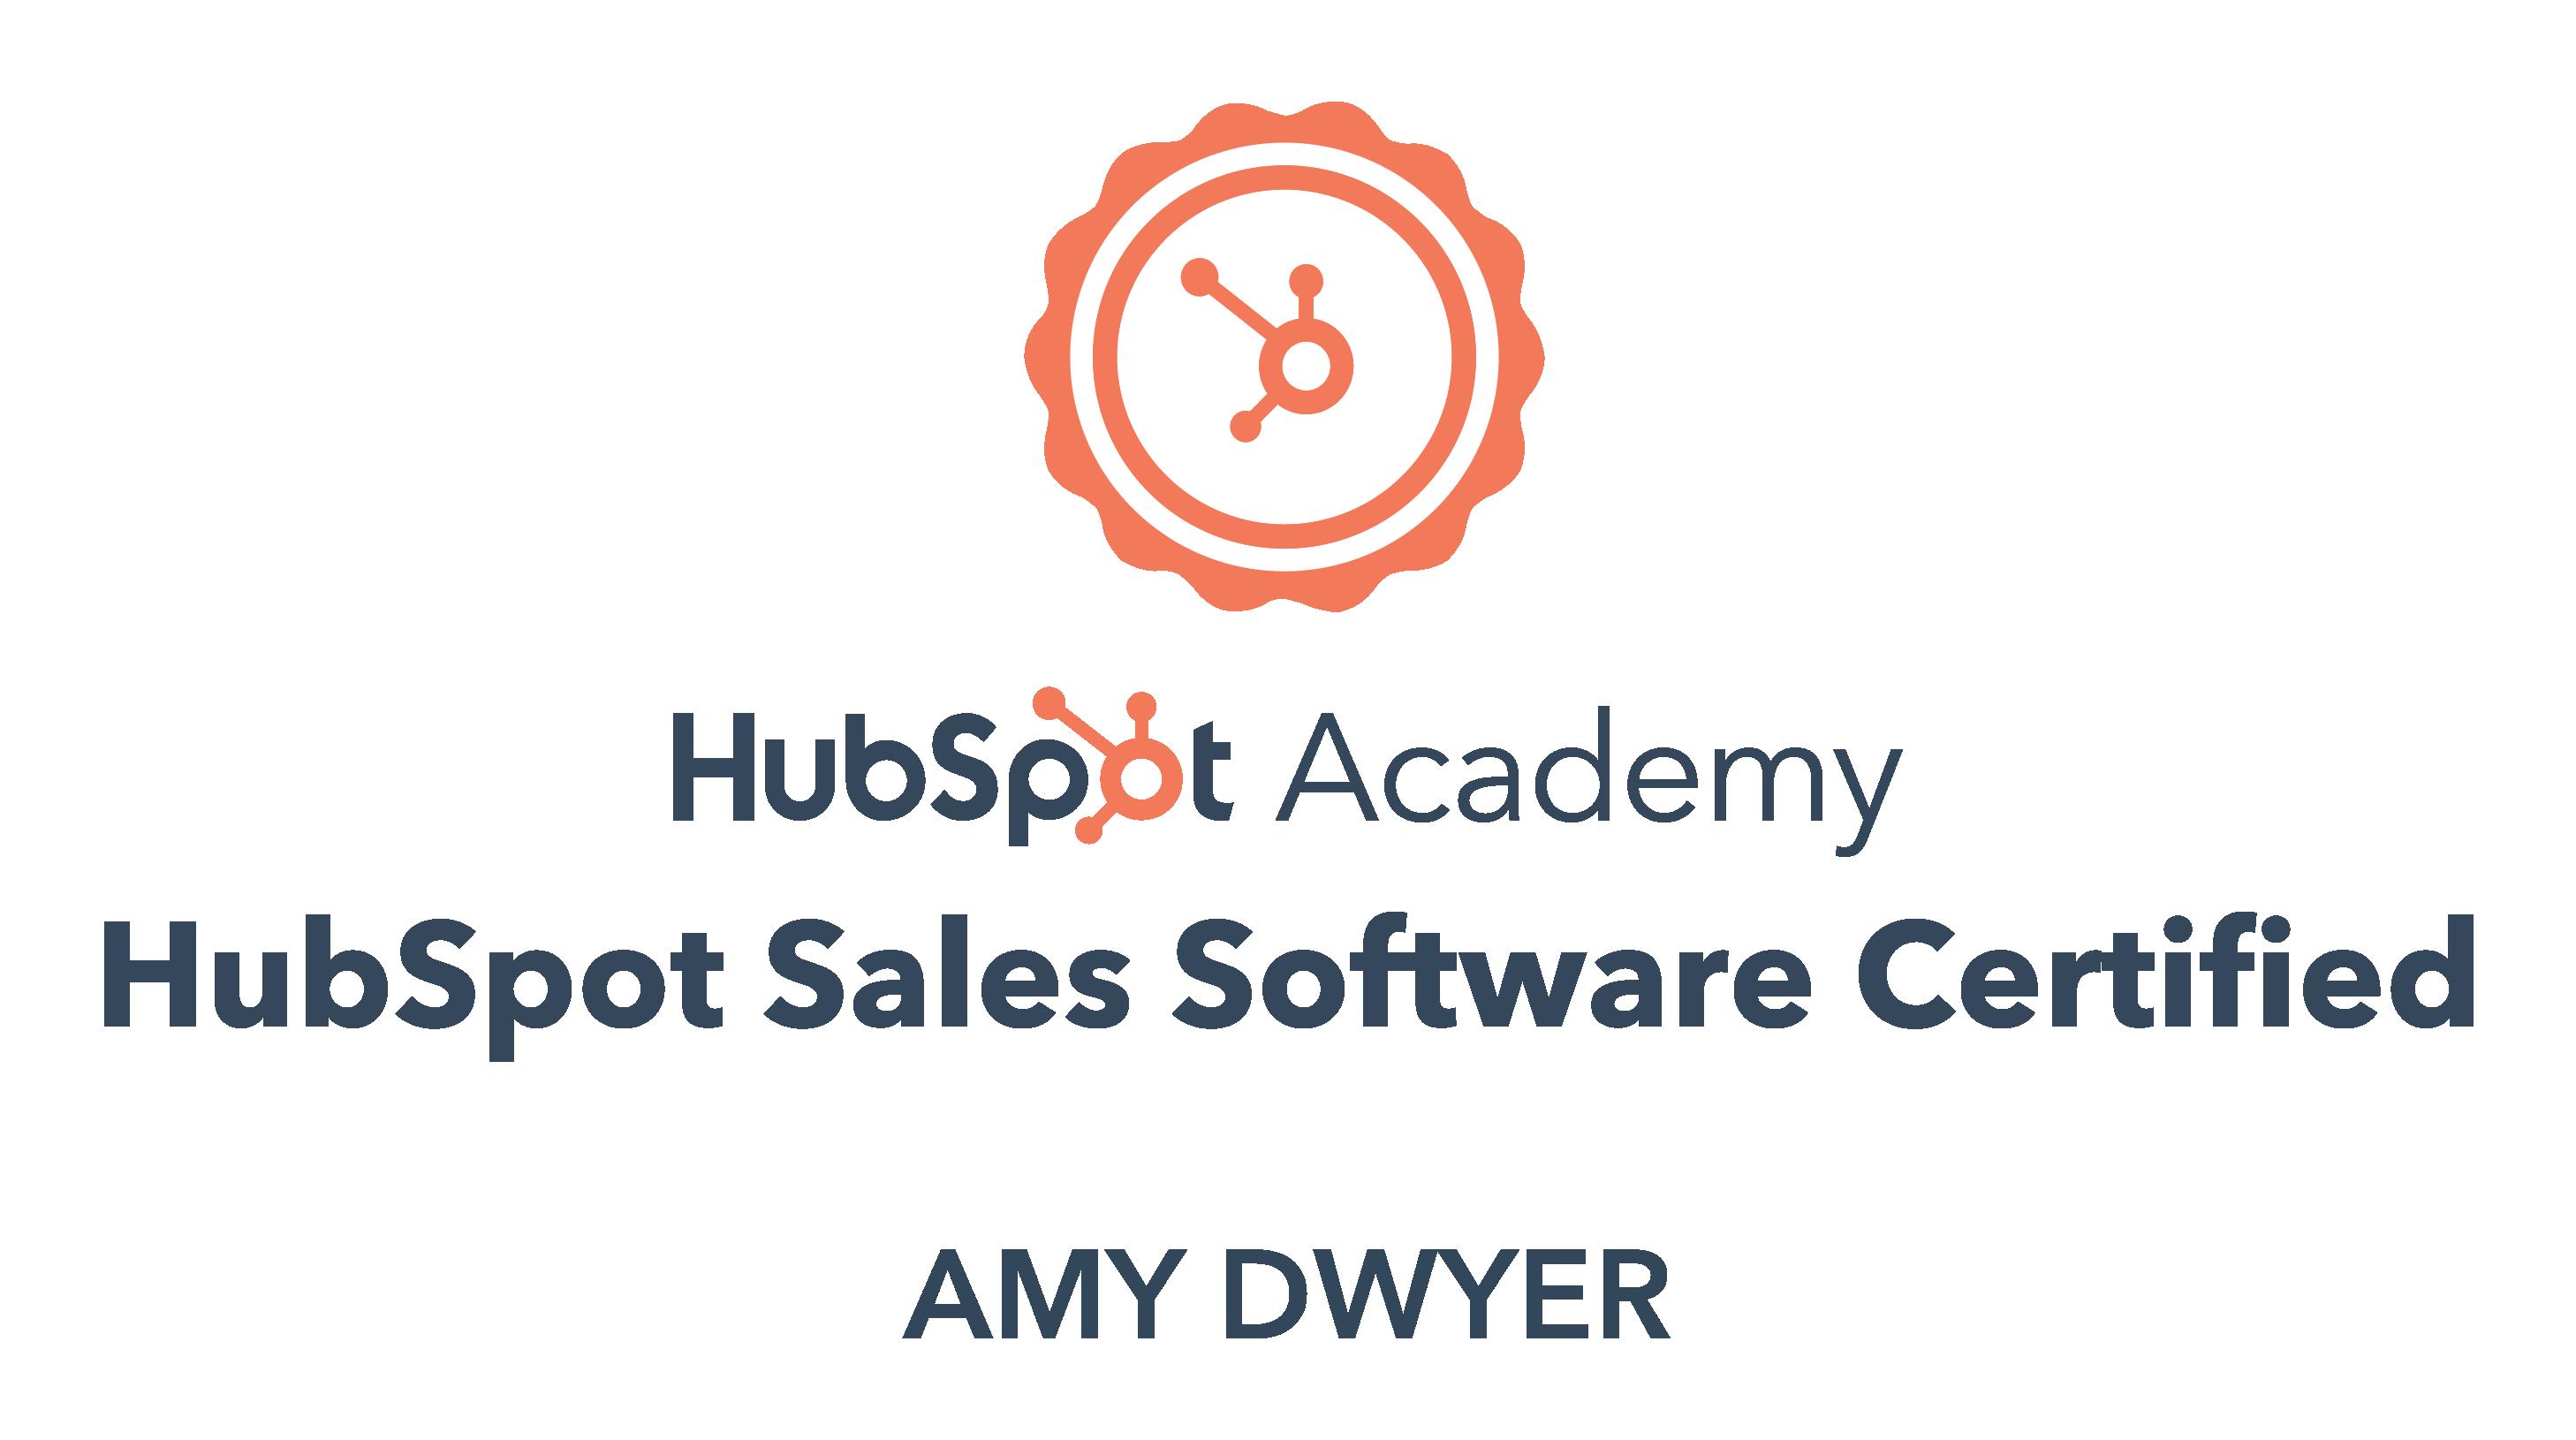 HubSpot sales software certified Amy Dwyer